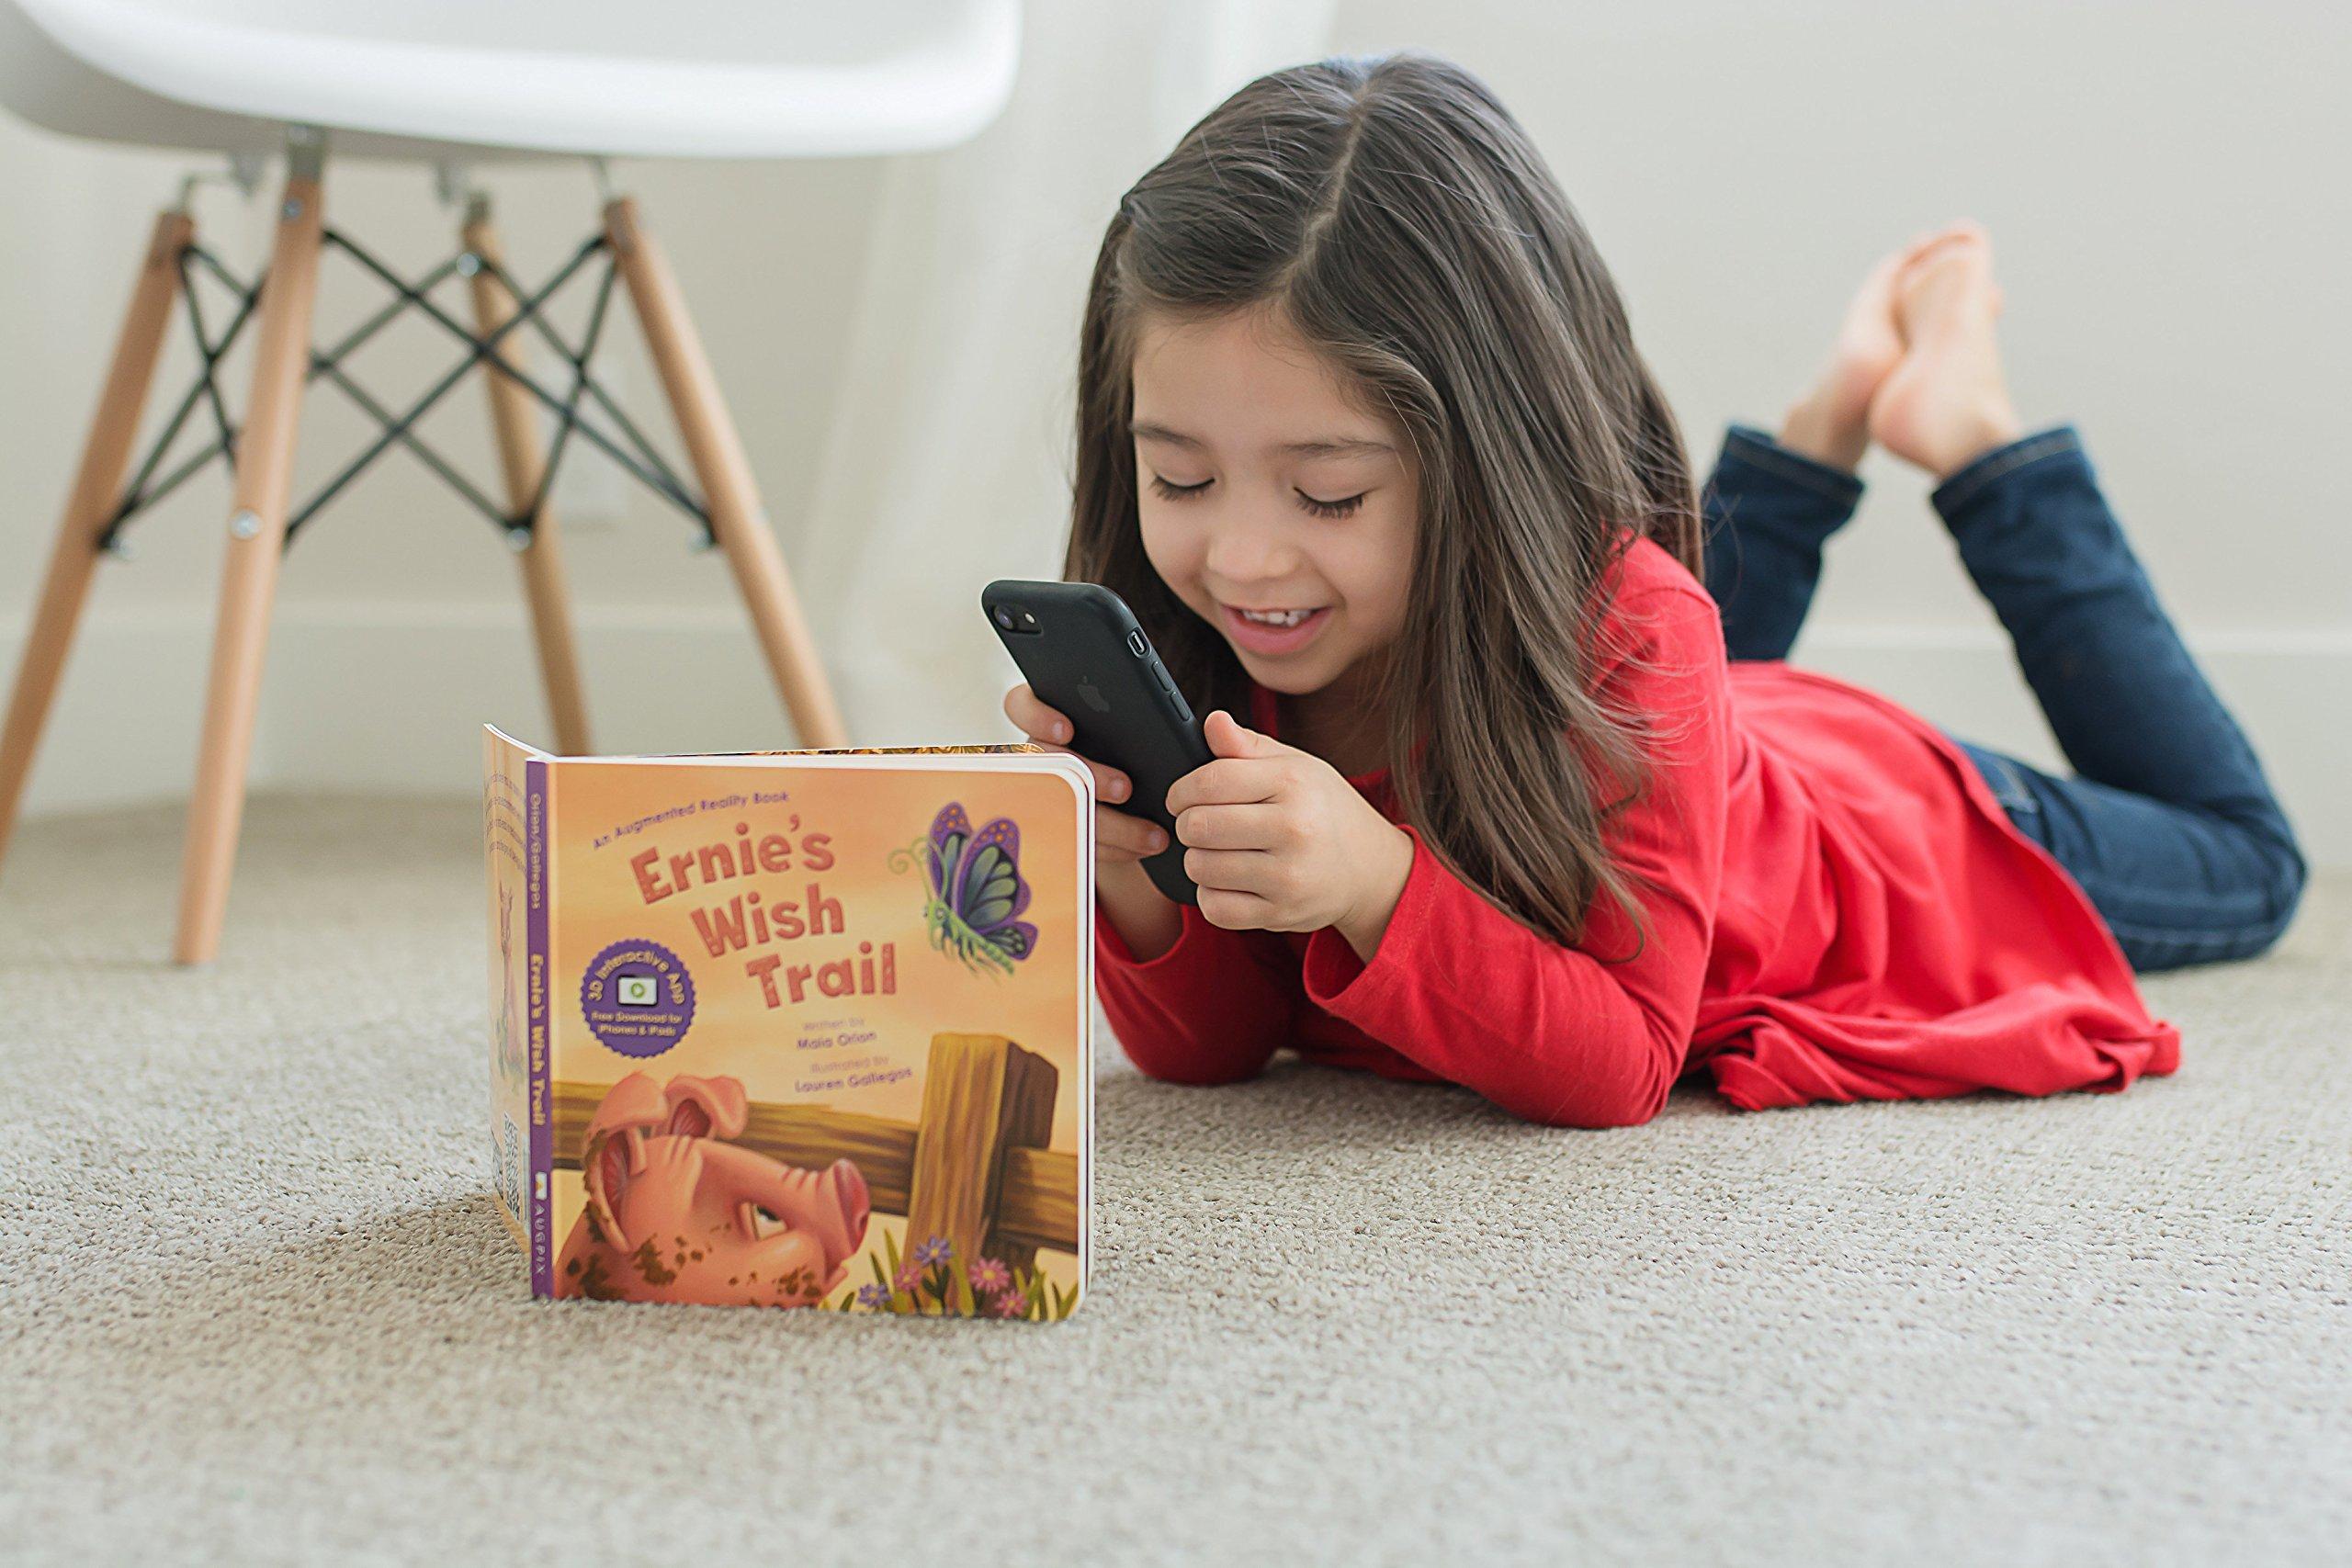 Ernie's Wish Trail: A 3D Interactive Children's Picture Book